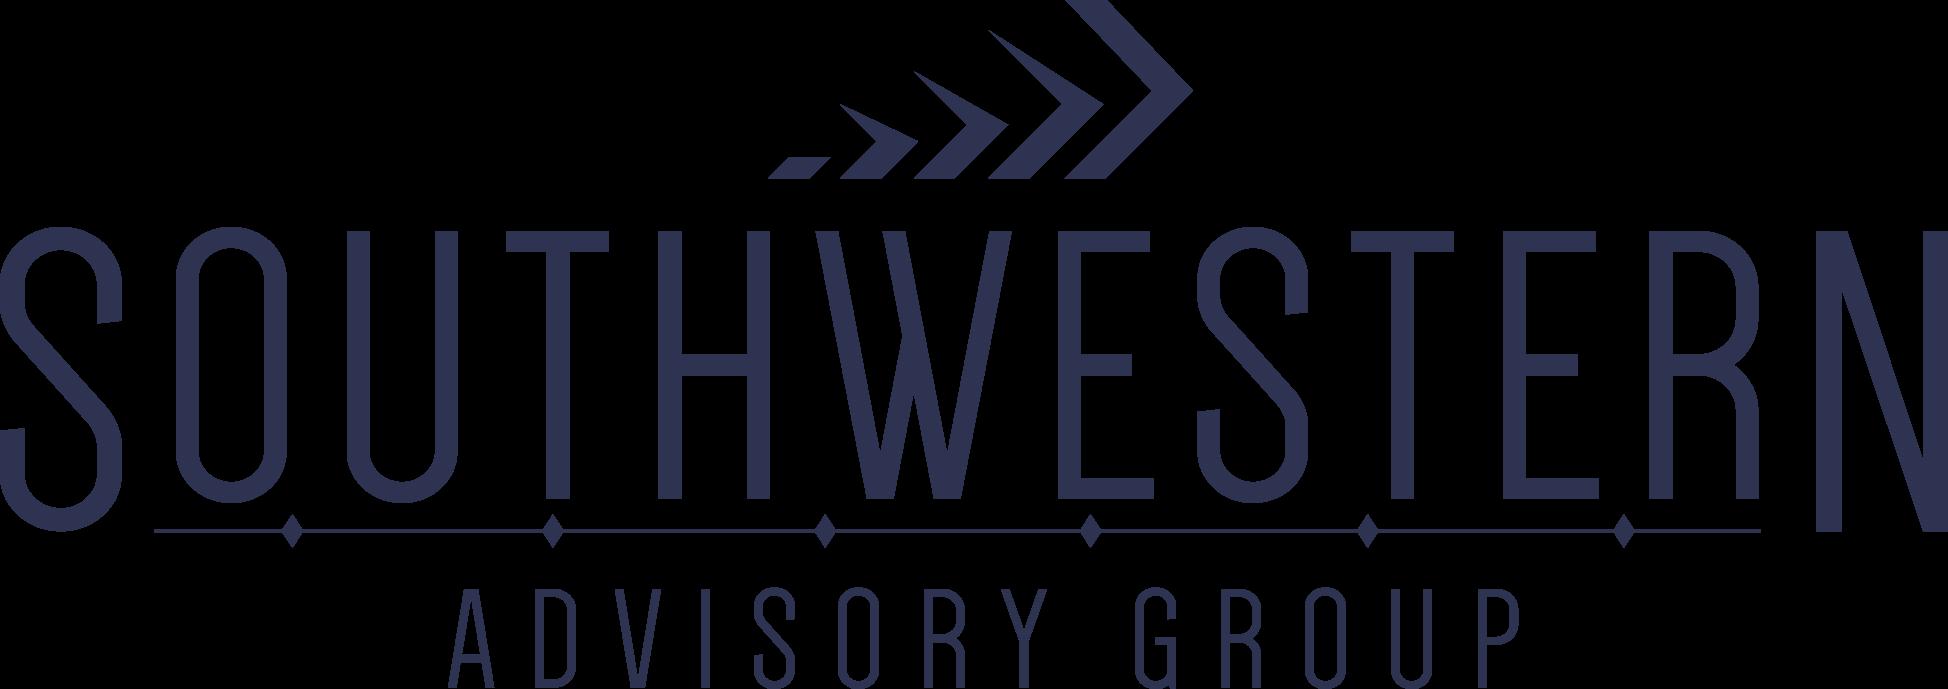 Southwestern Advisory Group brand logo